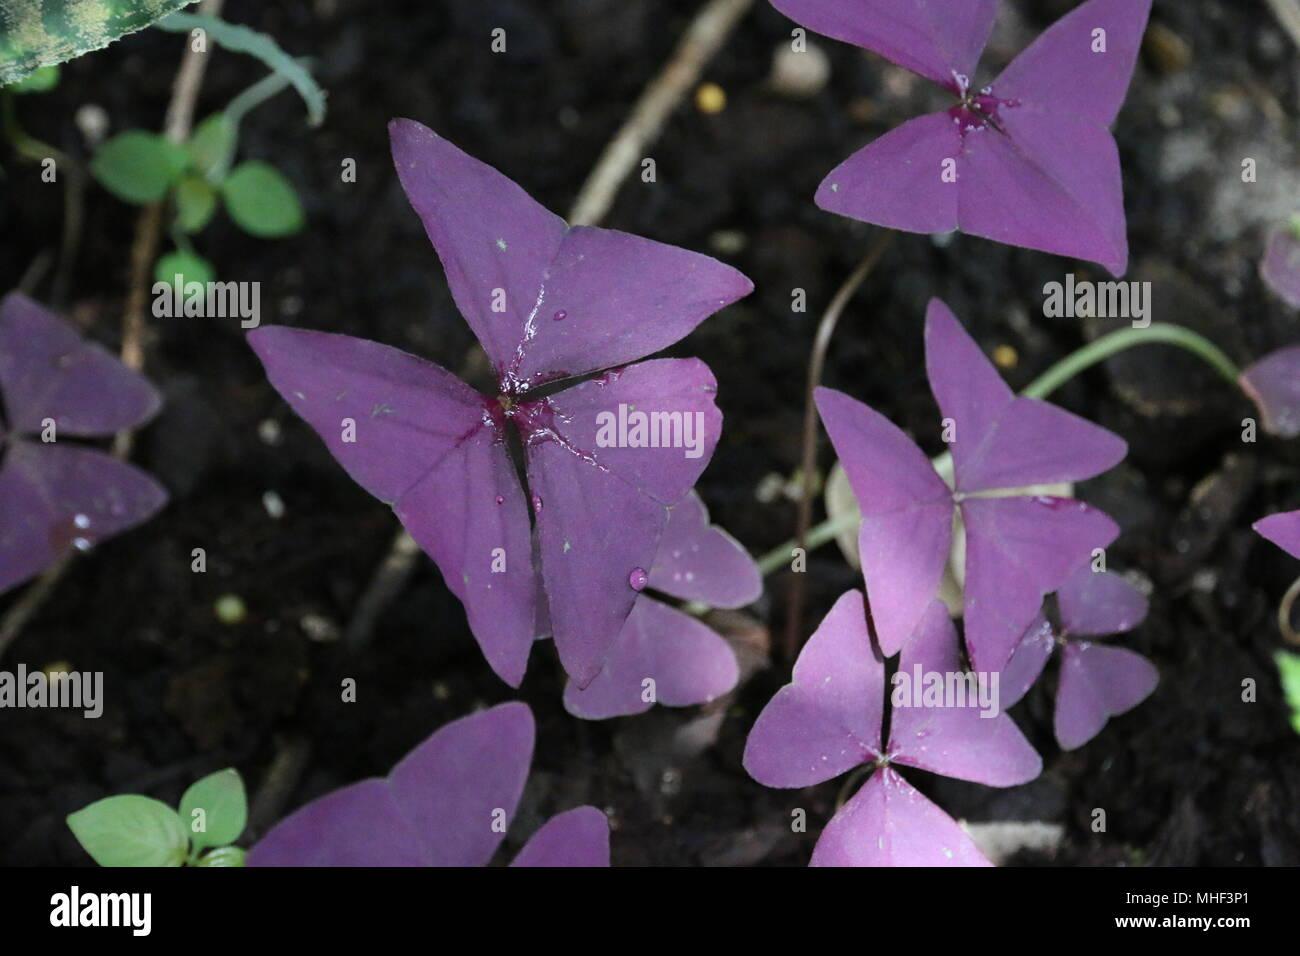 Beautiful purple unique tropical flowers stock photo 182885081 alamy beautiful purple unique tropical flowers izmirmasajfo